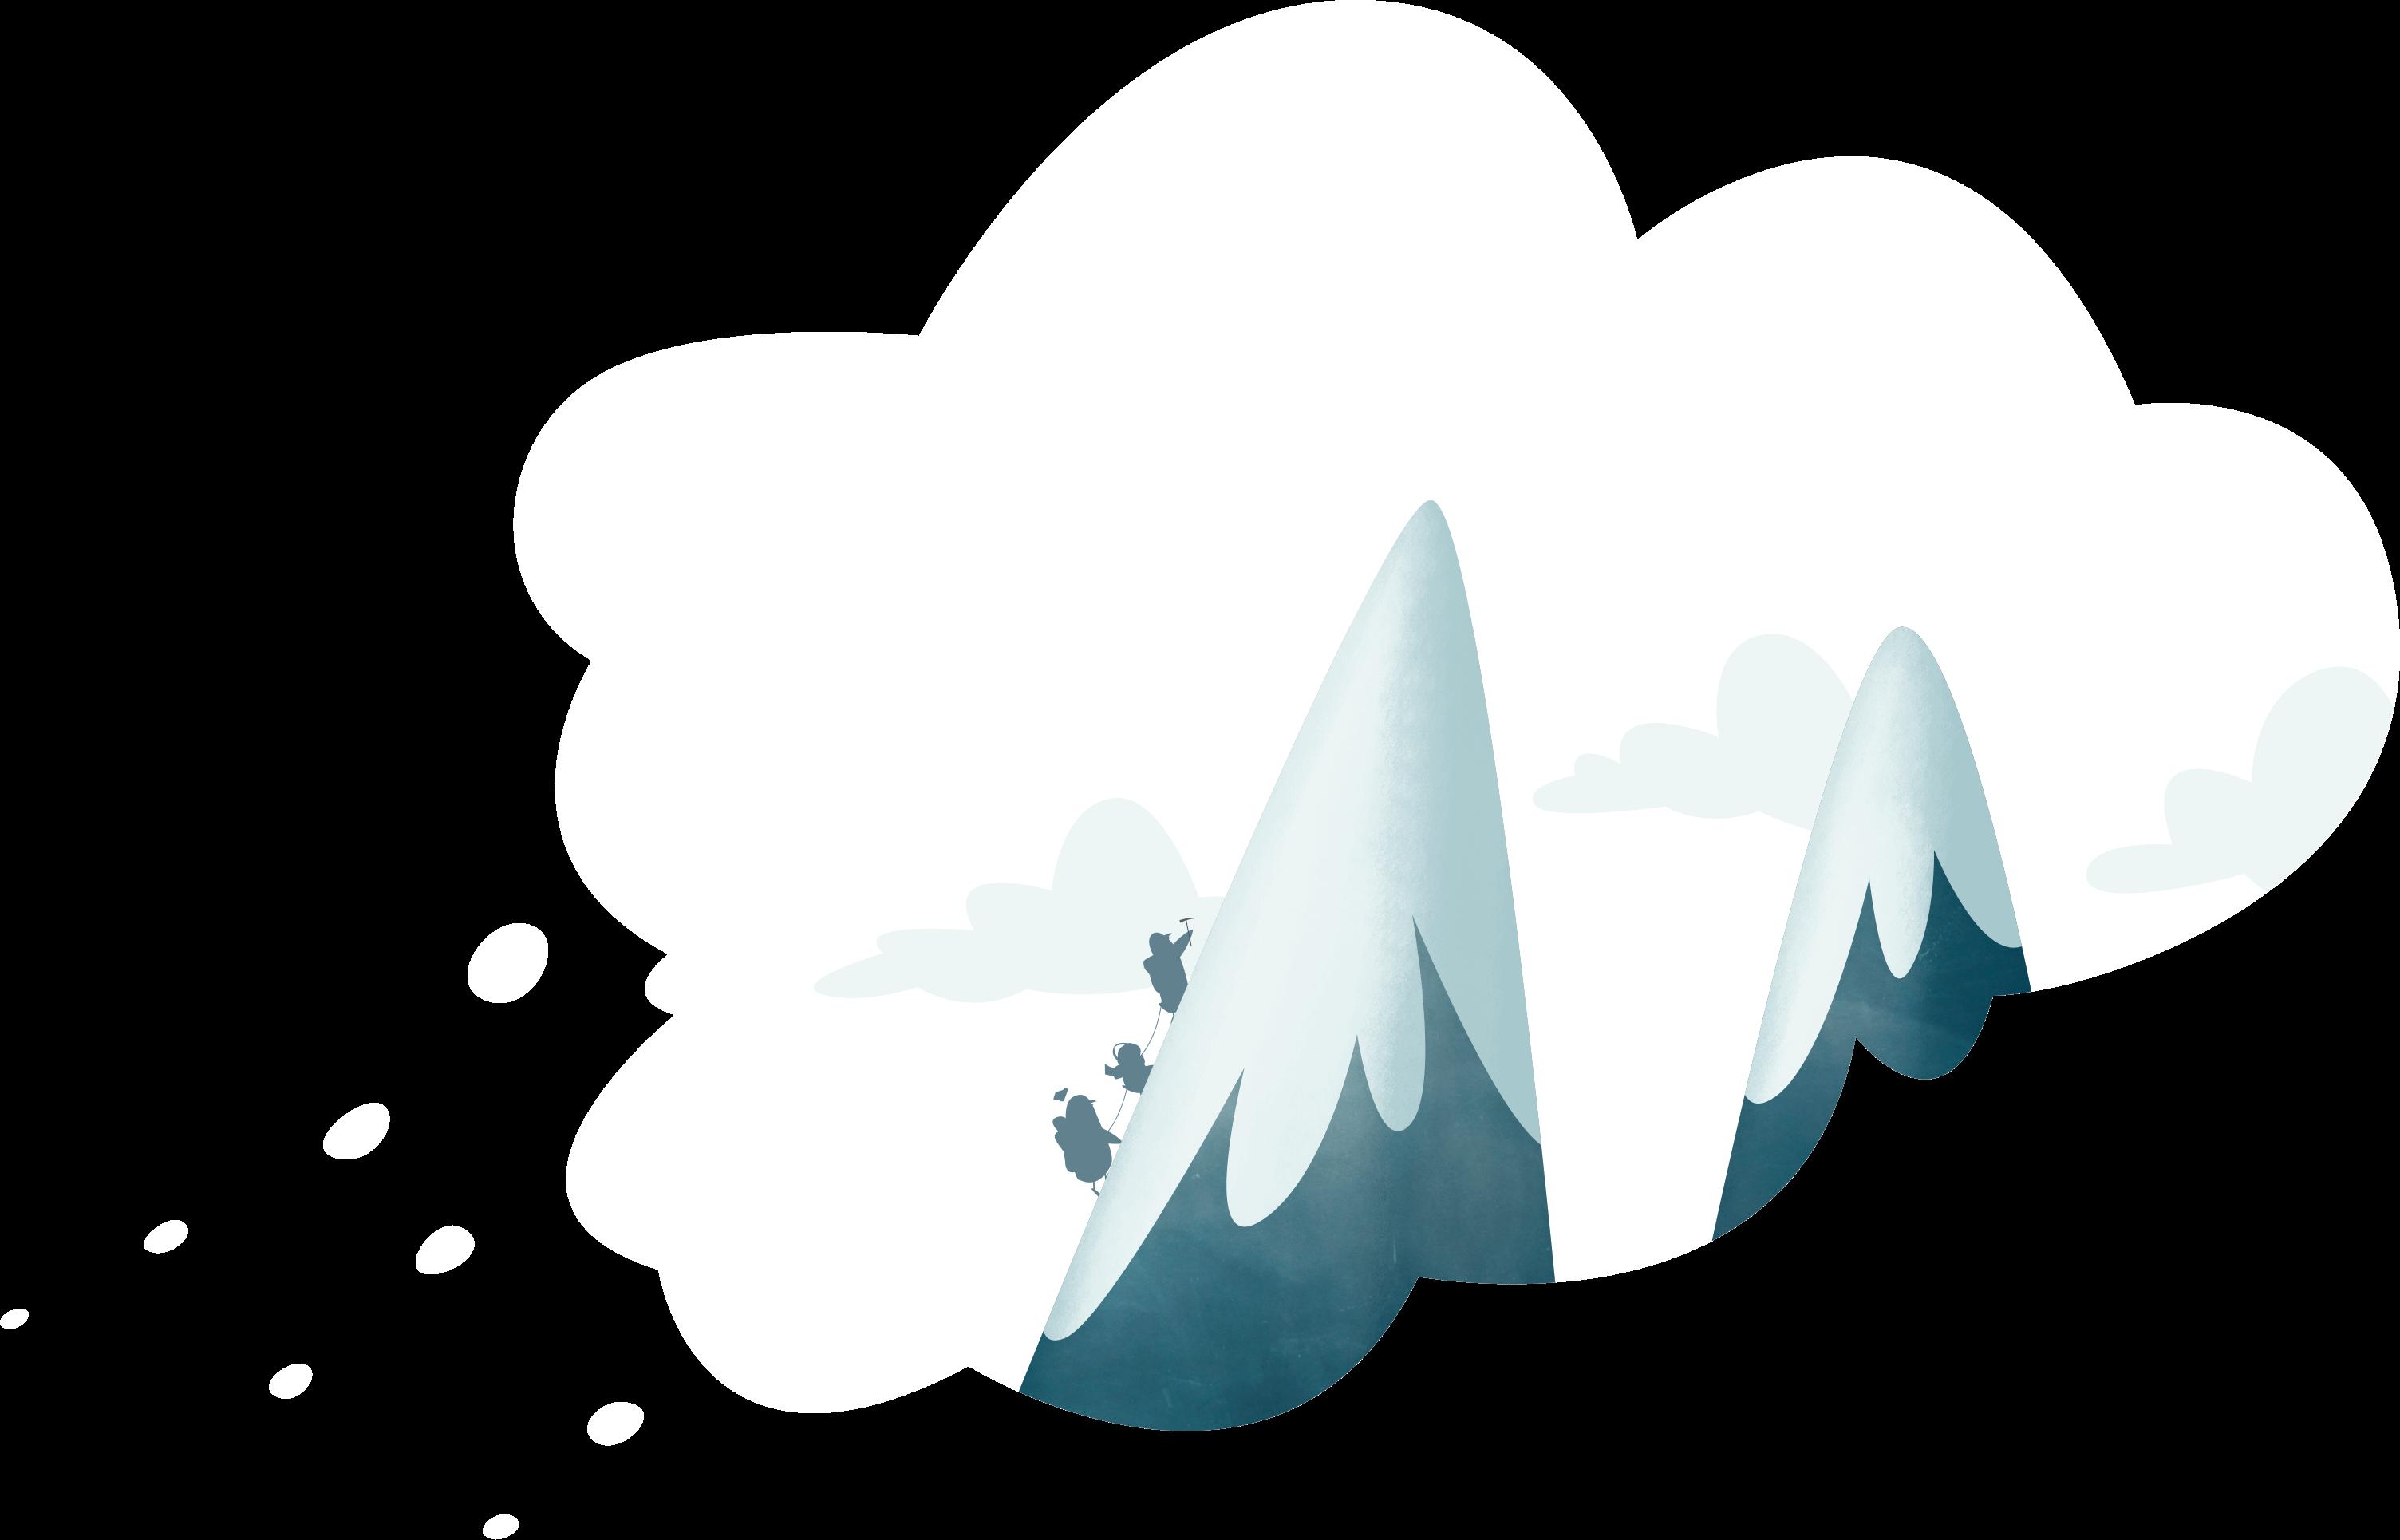 Mountain climbing thought bubble